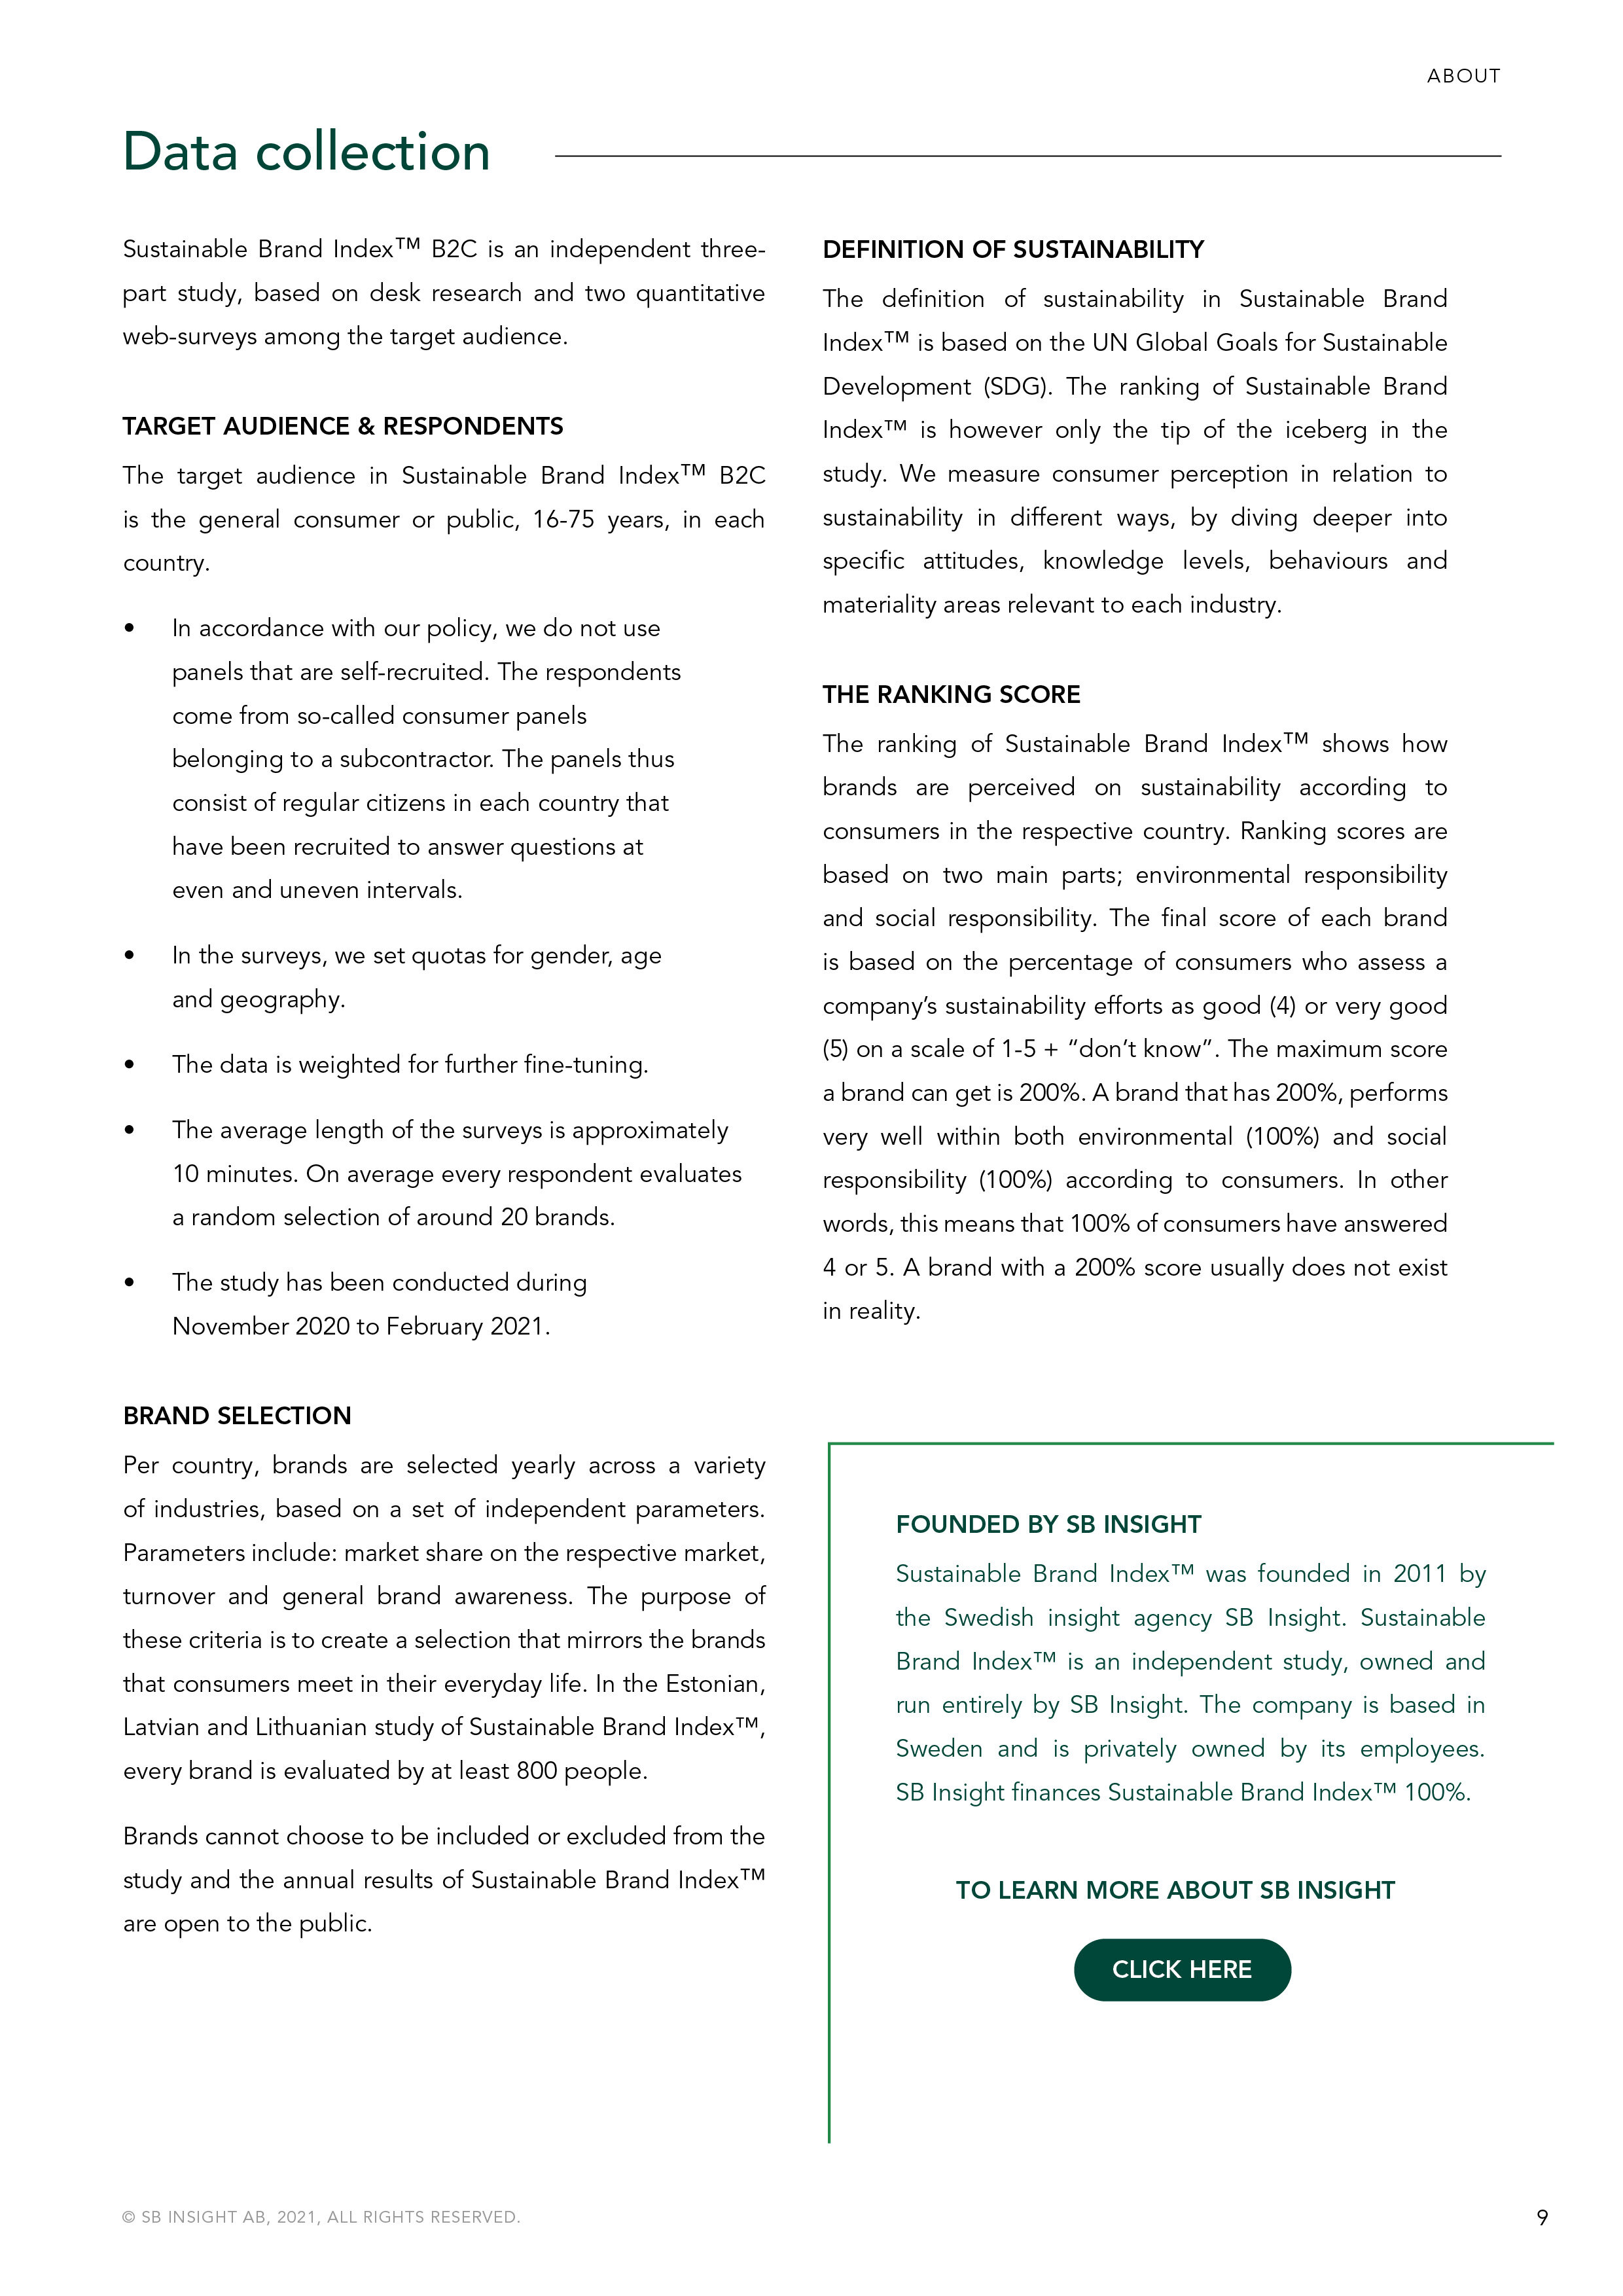 EST_Official Report_20219.jpg